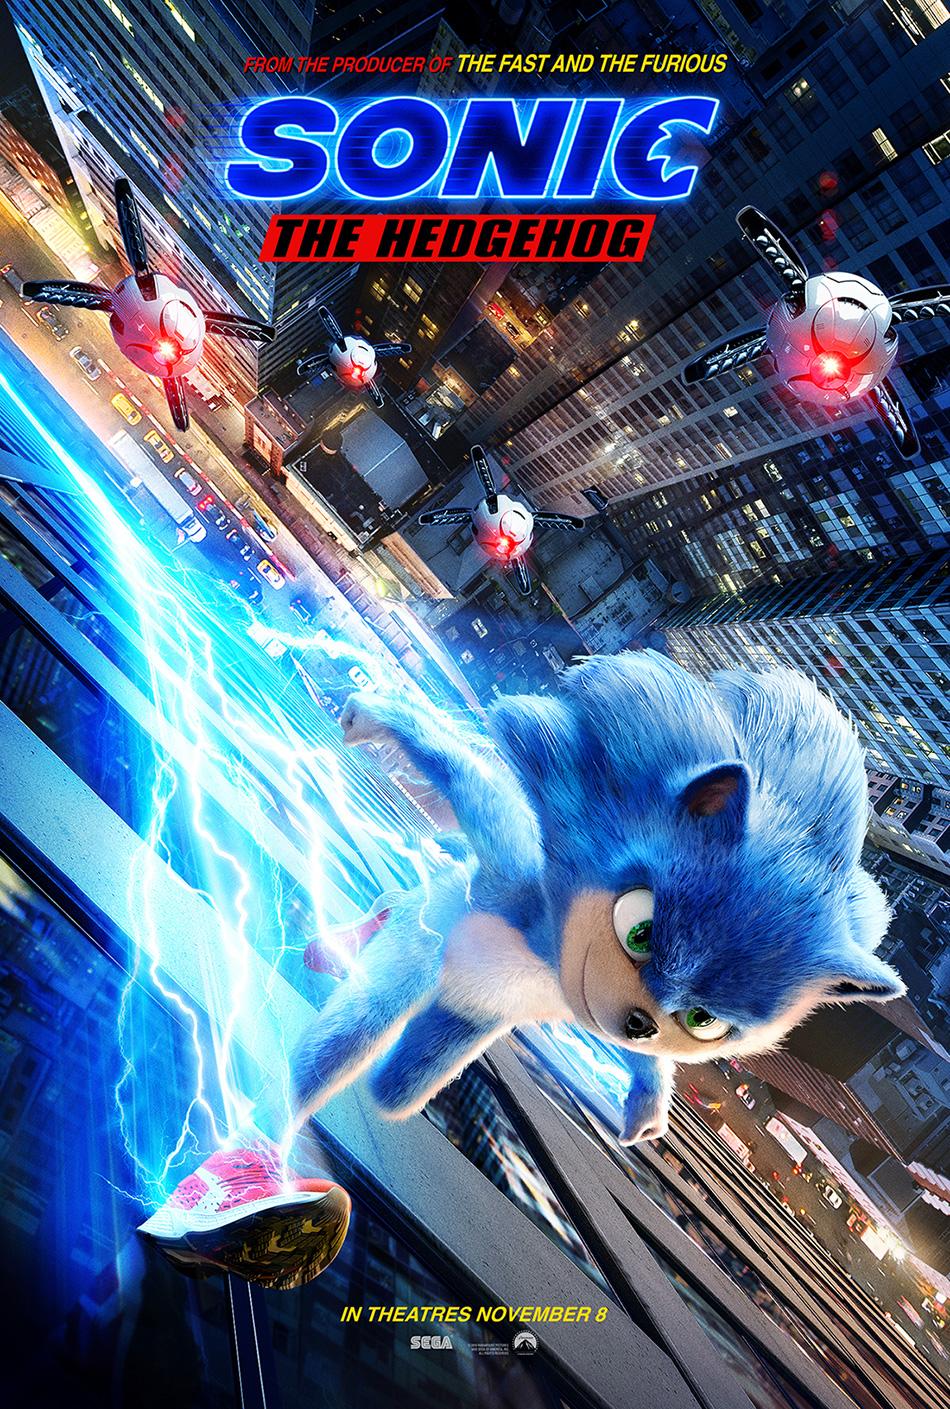 Sonic the Hedgehog 1-Sheet.jpg